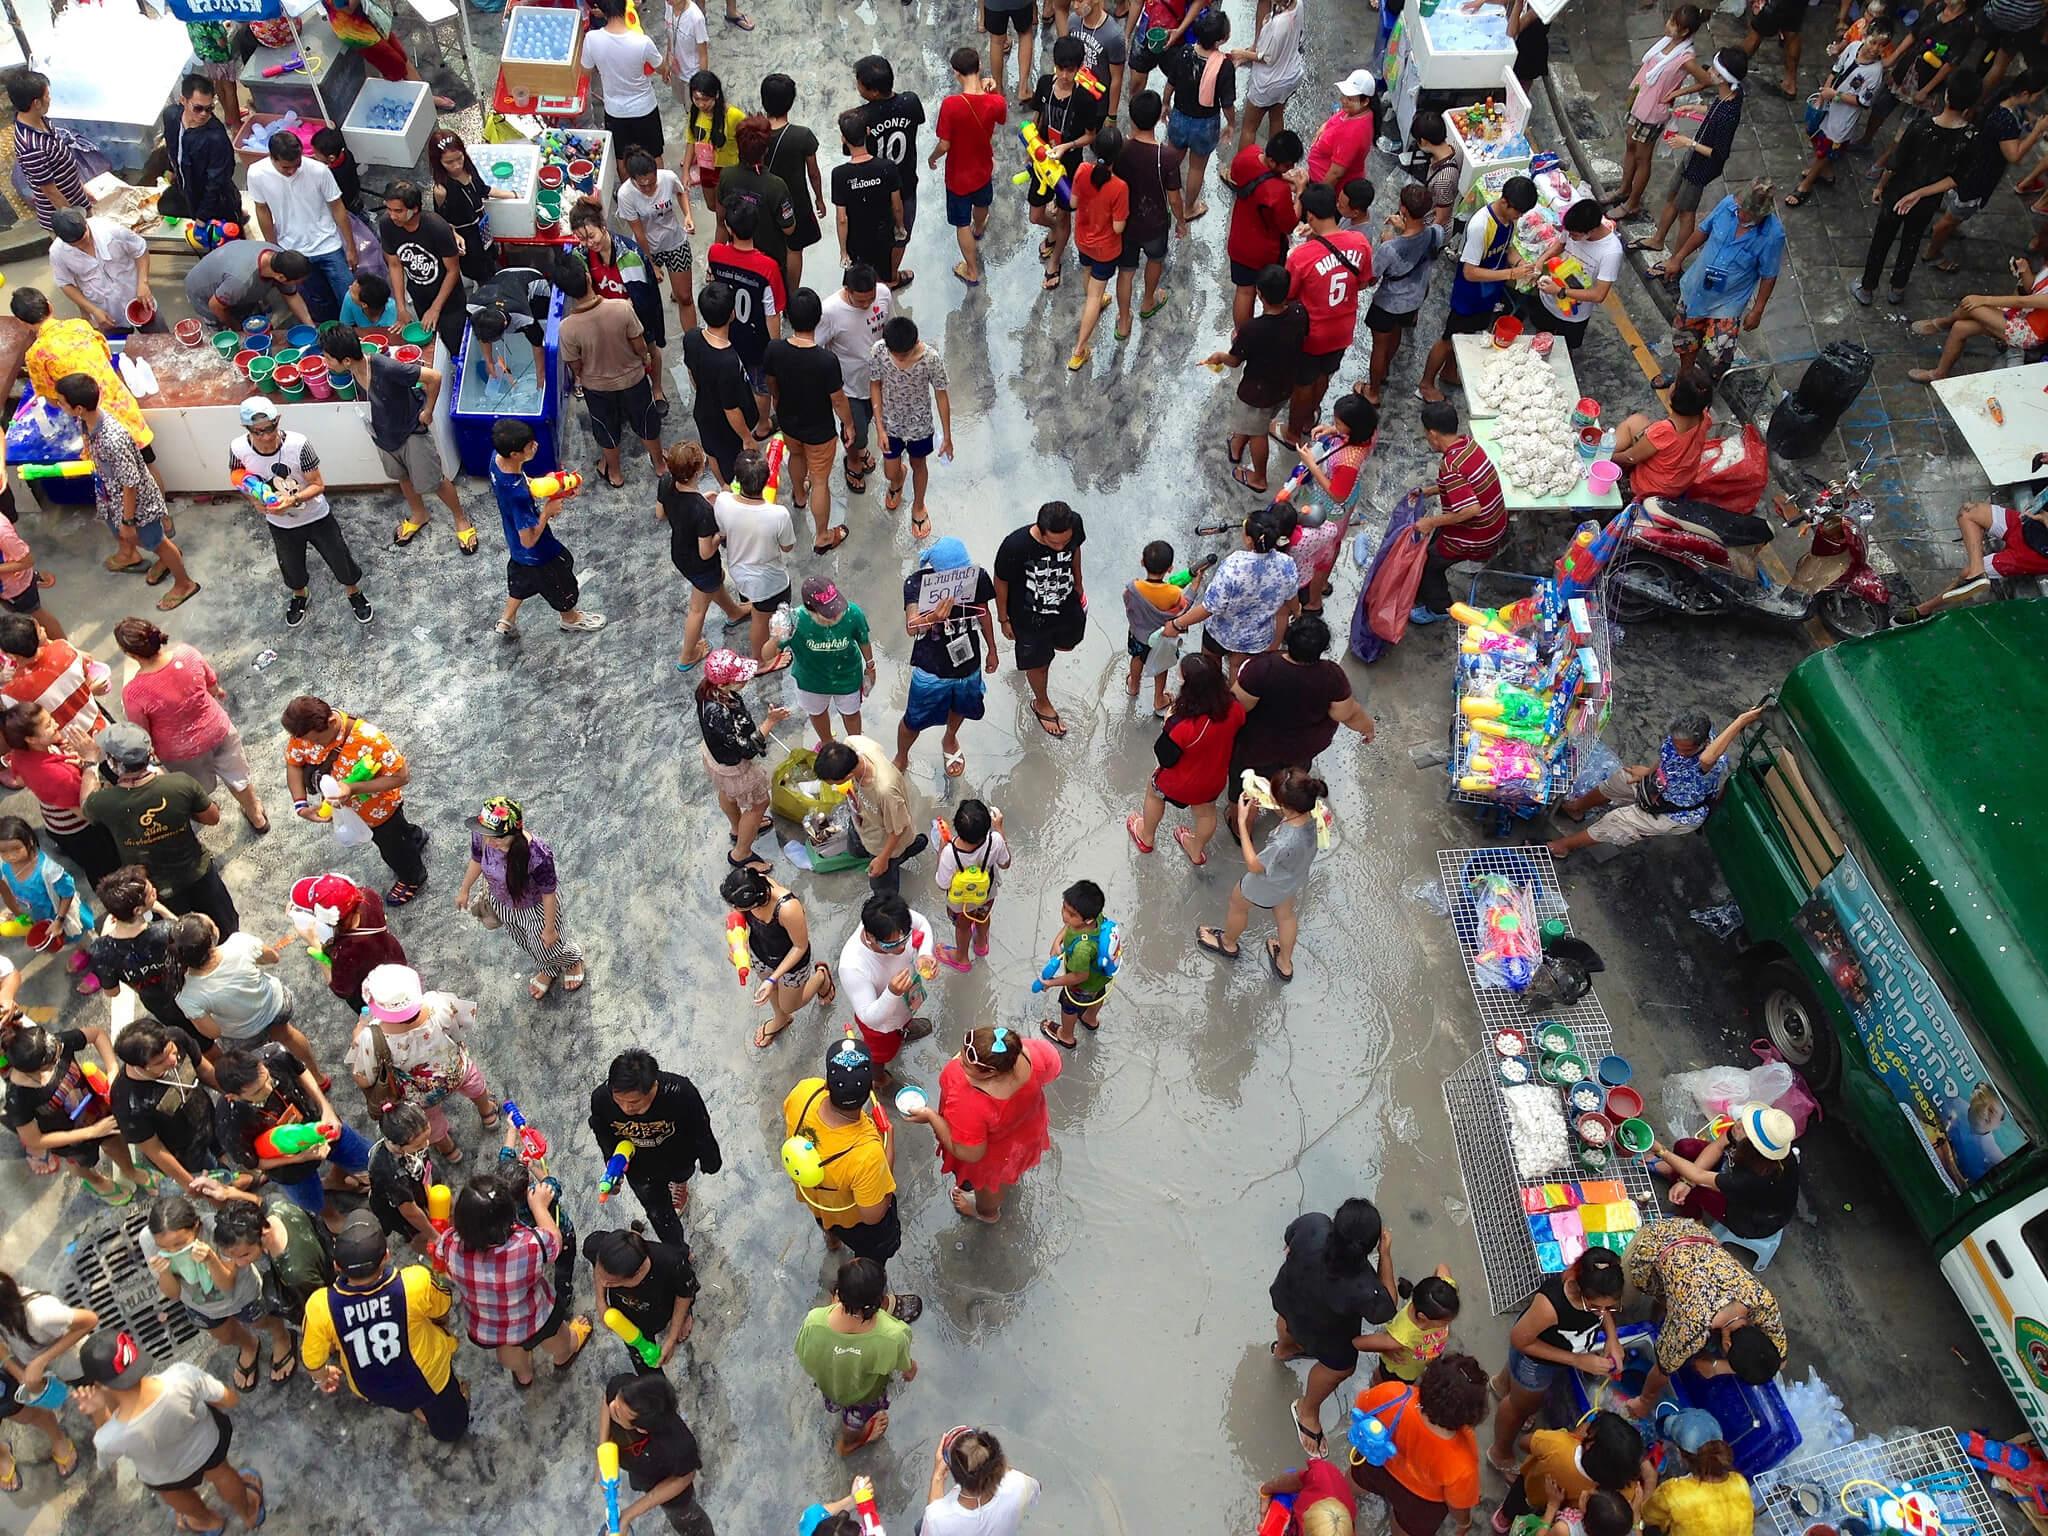 Таиланд, фестиваль Сонгкран, водные бои.